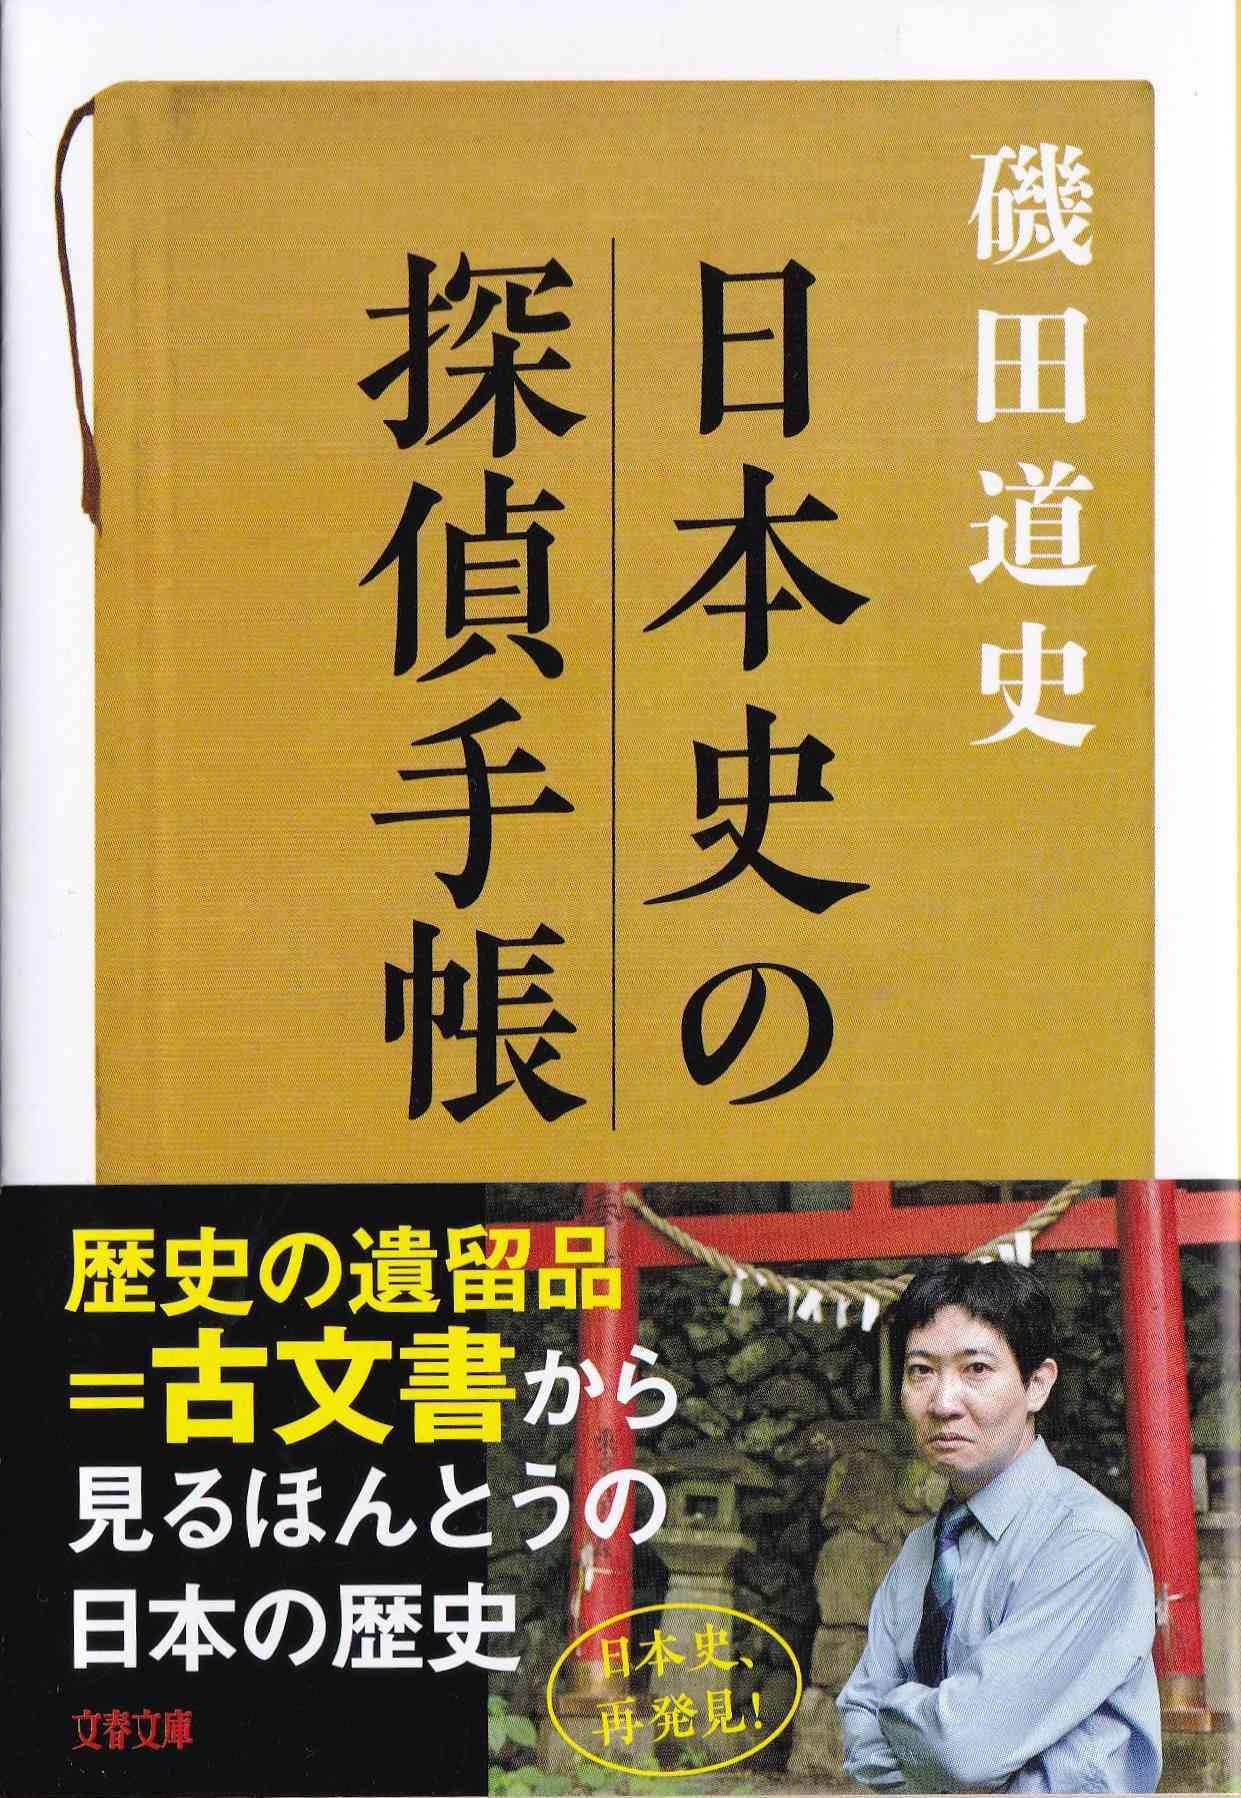 日本史の探偵手帳_d0338347_18072046.jpg